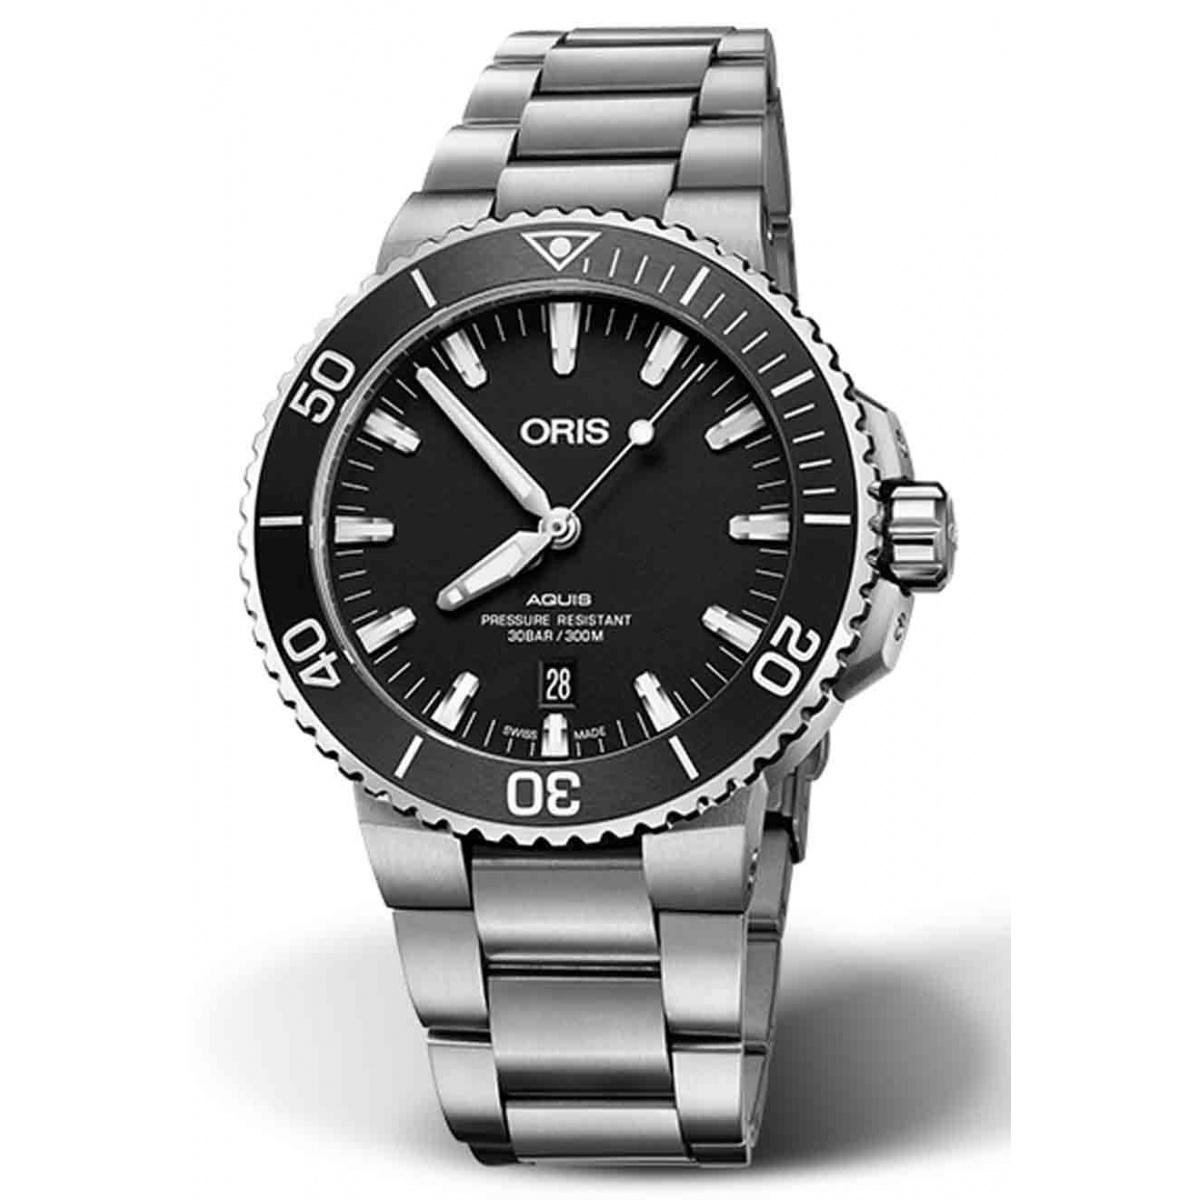 ORIS AQUIS DATE 300 M ∅43,5 mm , Esfera negra, brazalete de acero